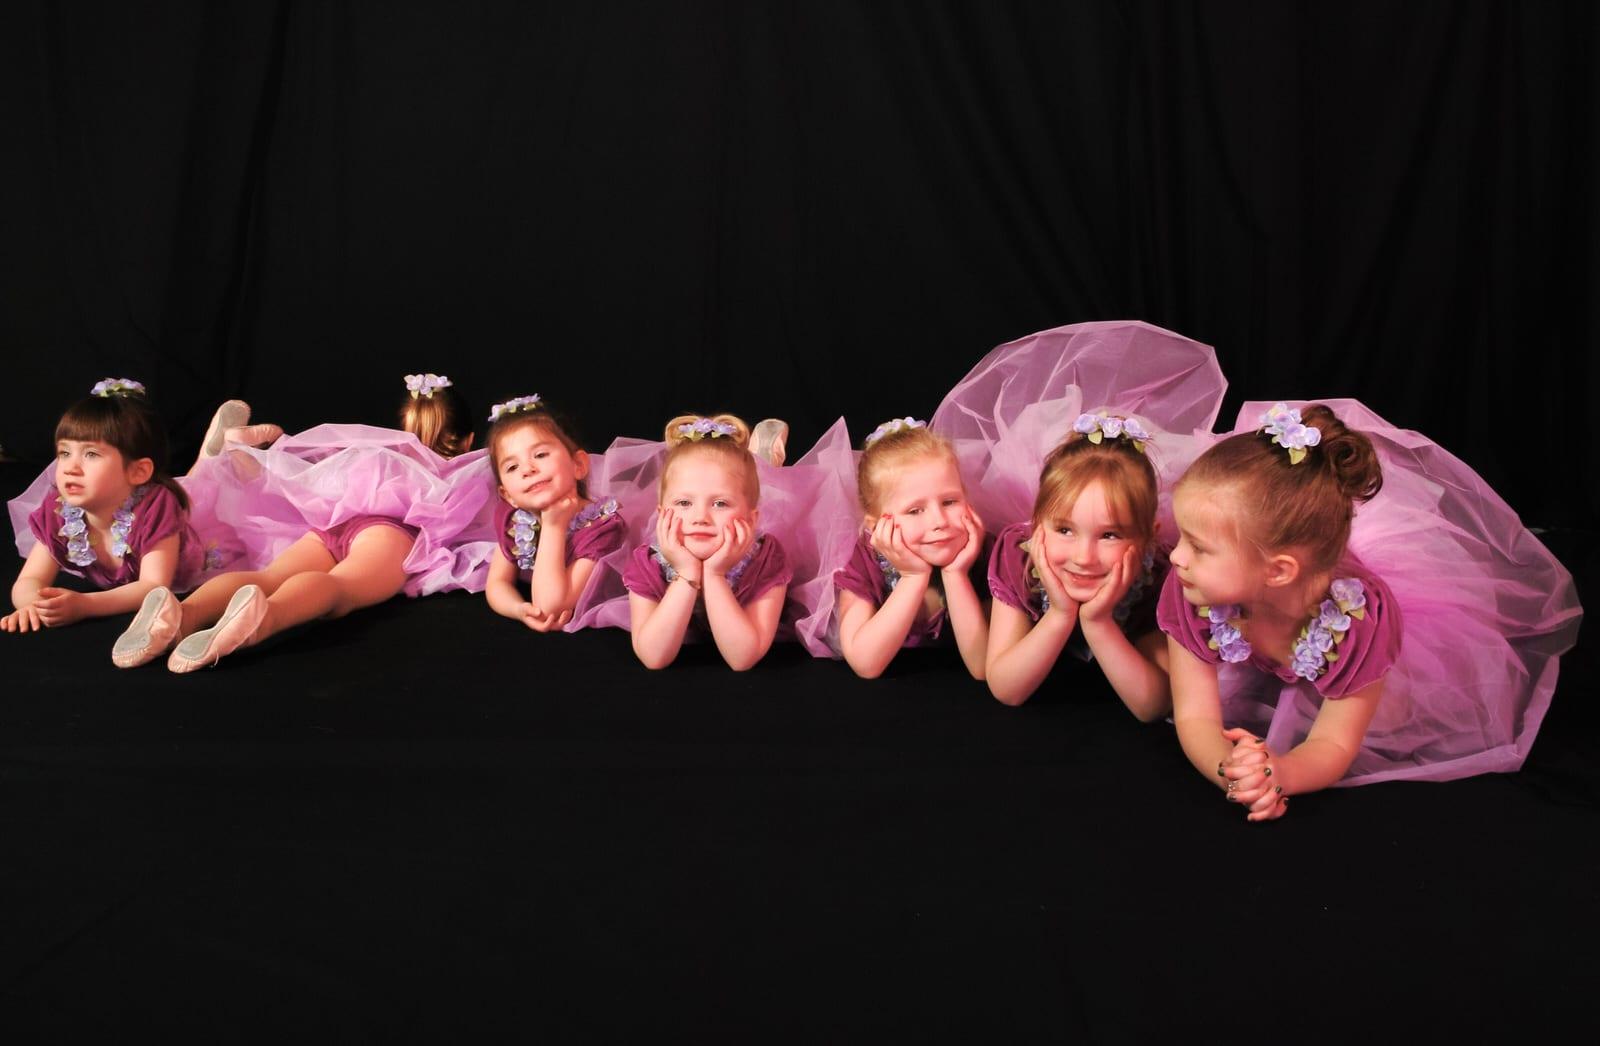 Ballet-Dancers-Girls-Tutus-Portraits.jpg